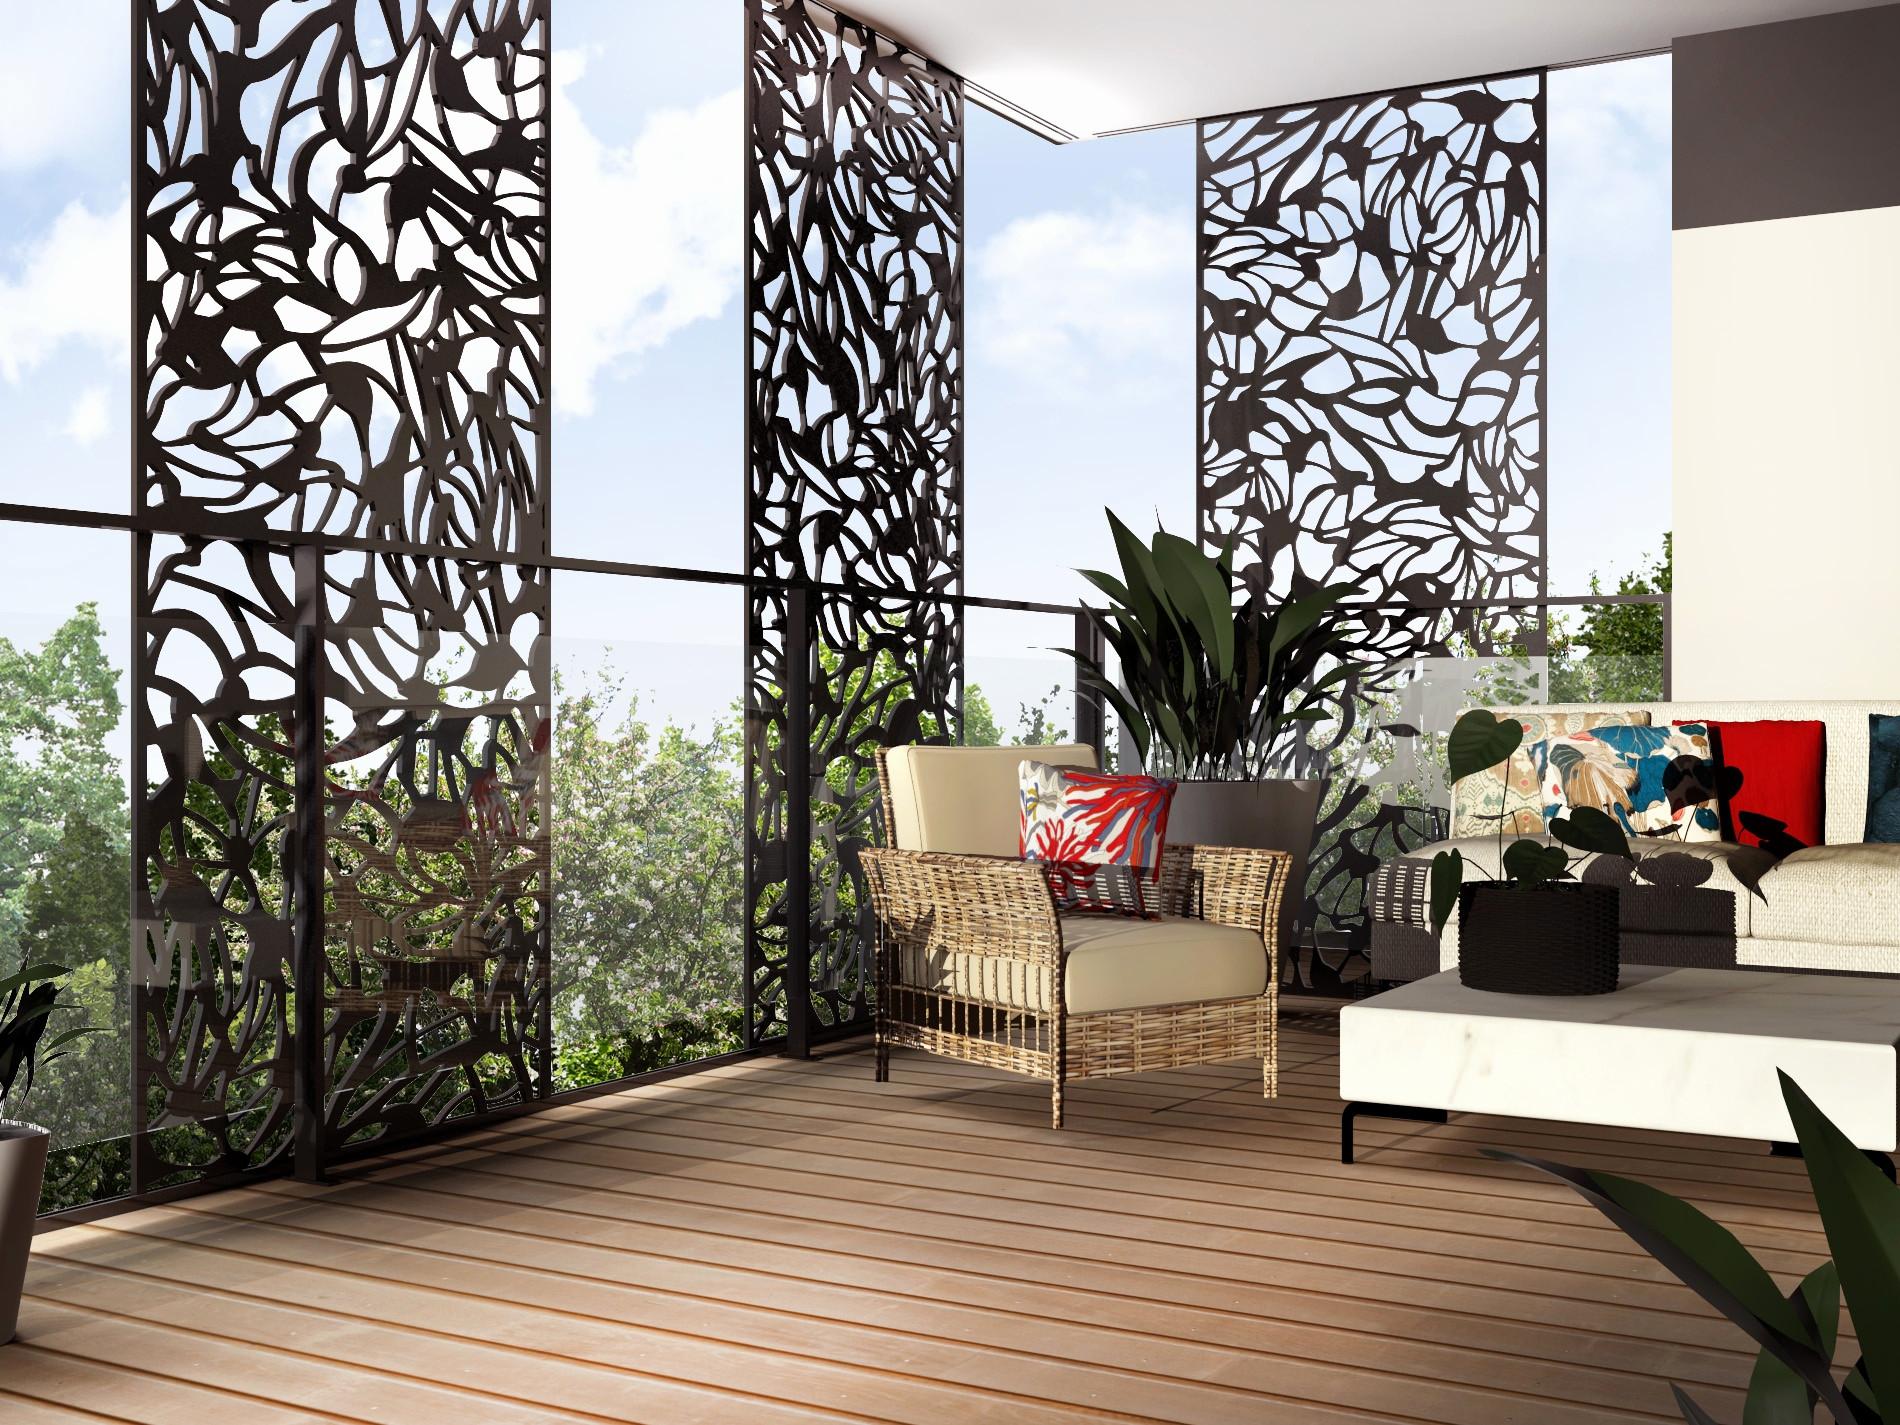 Brouette Deco Jardin Impressionnant Photos Brouette Decorative De Jardin En Bois Aussi Merveilleux 53 Moderne